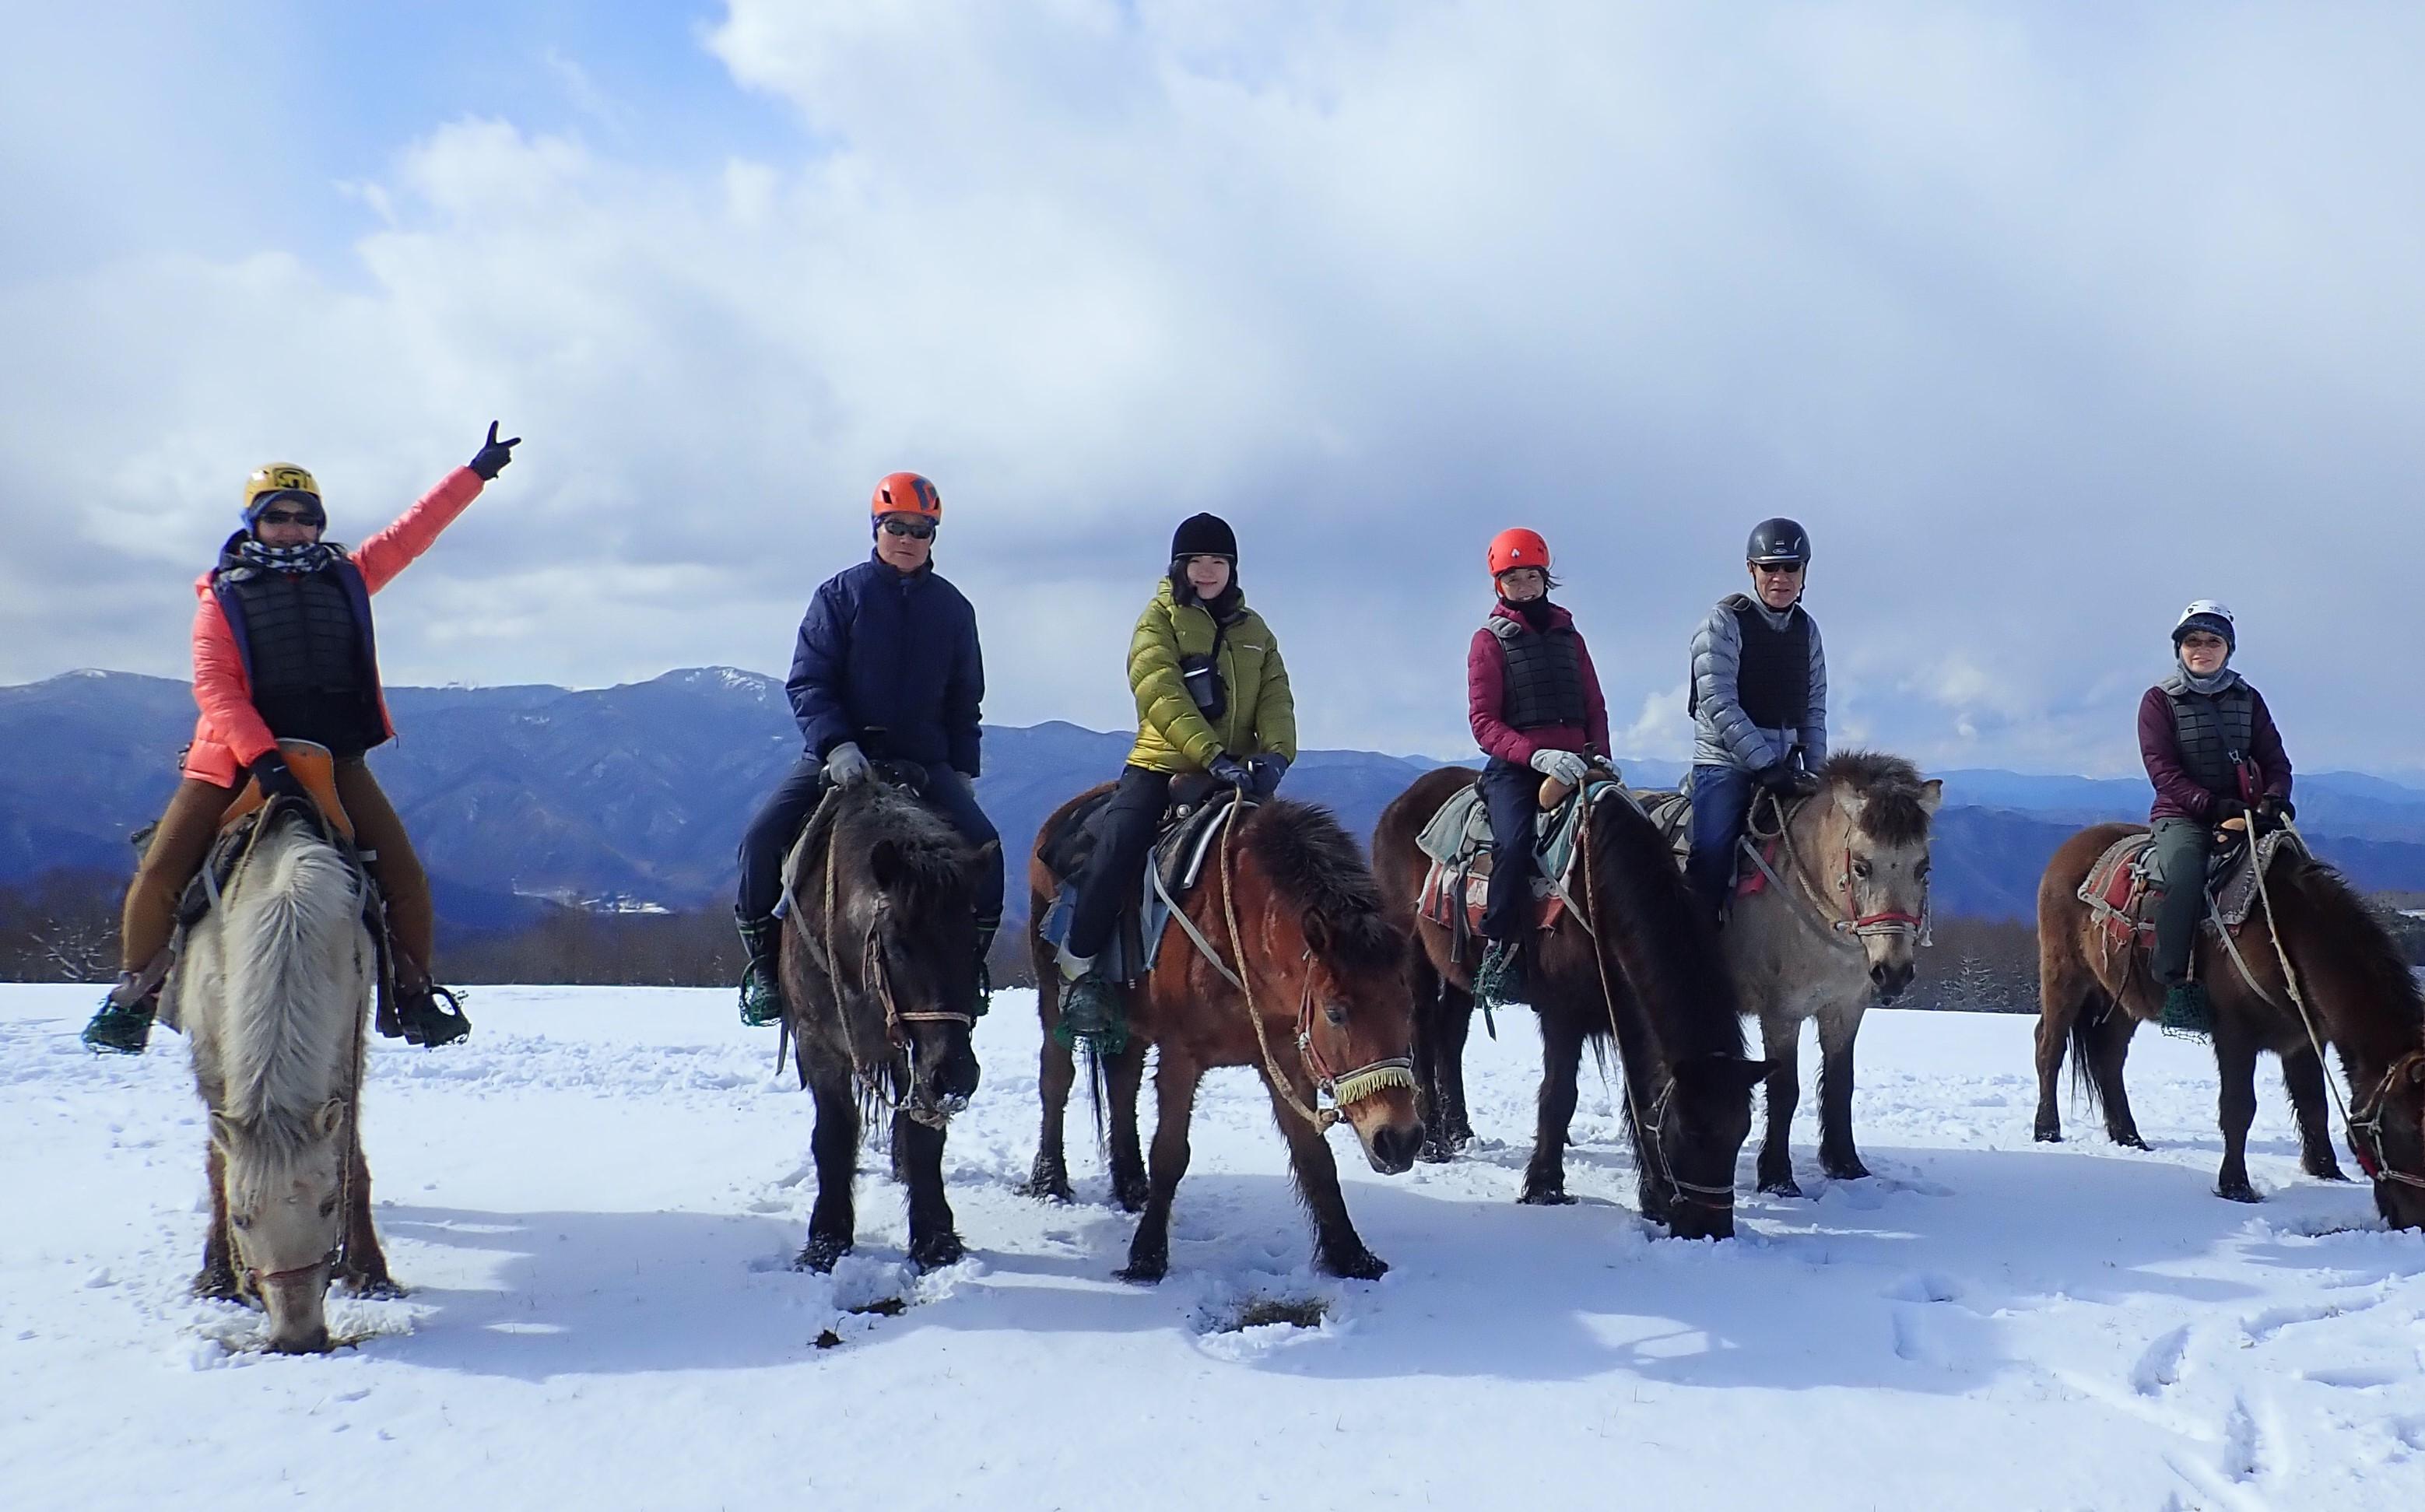 2020/03/15 乗馬体験